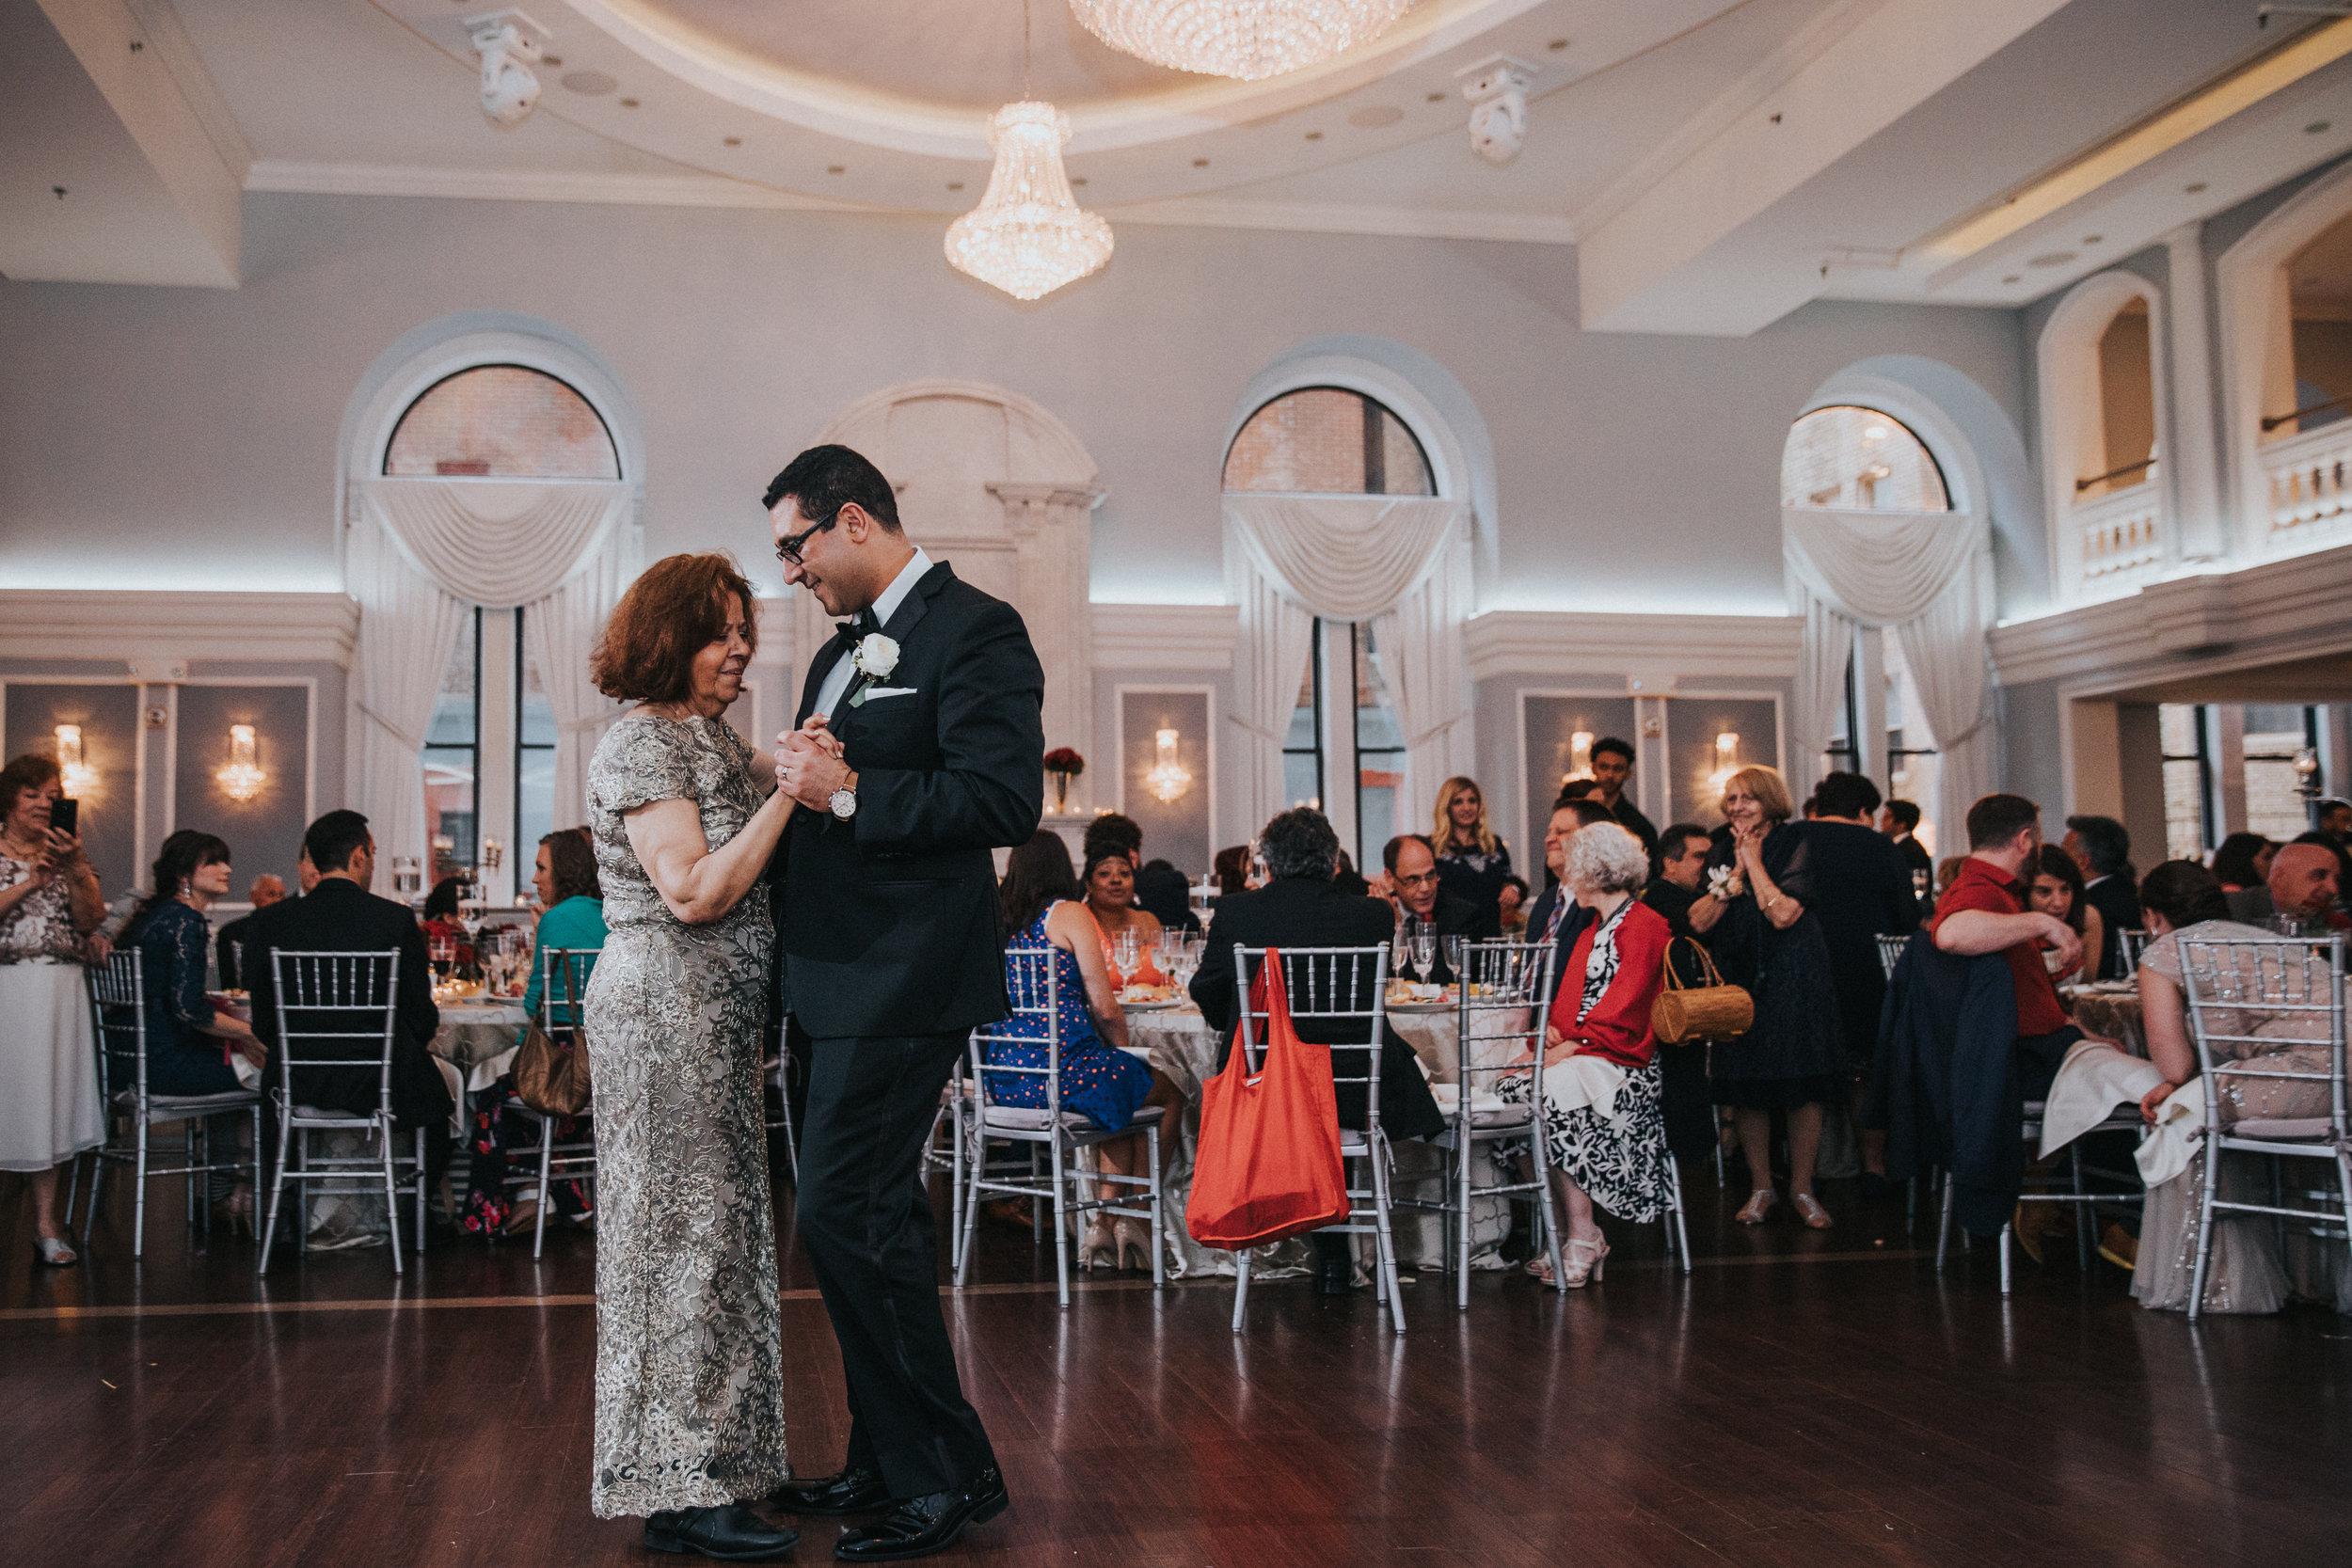 JennaLynnPhotography-NJWeddingPhotographer-Philadelphia-Wedding-ArtsBallroom-Reception-56.jpg